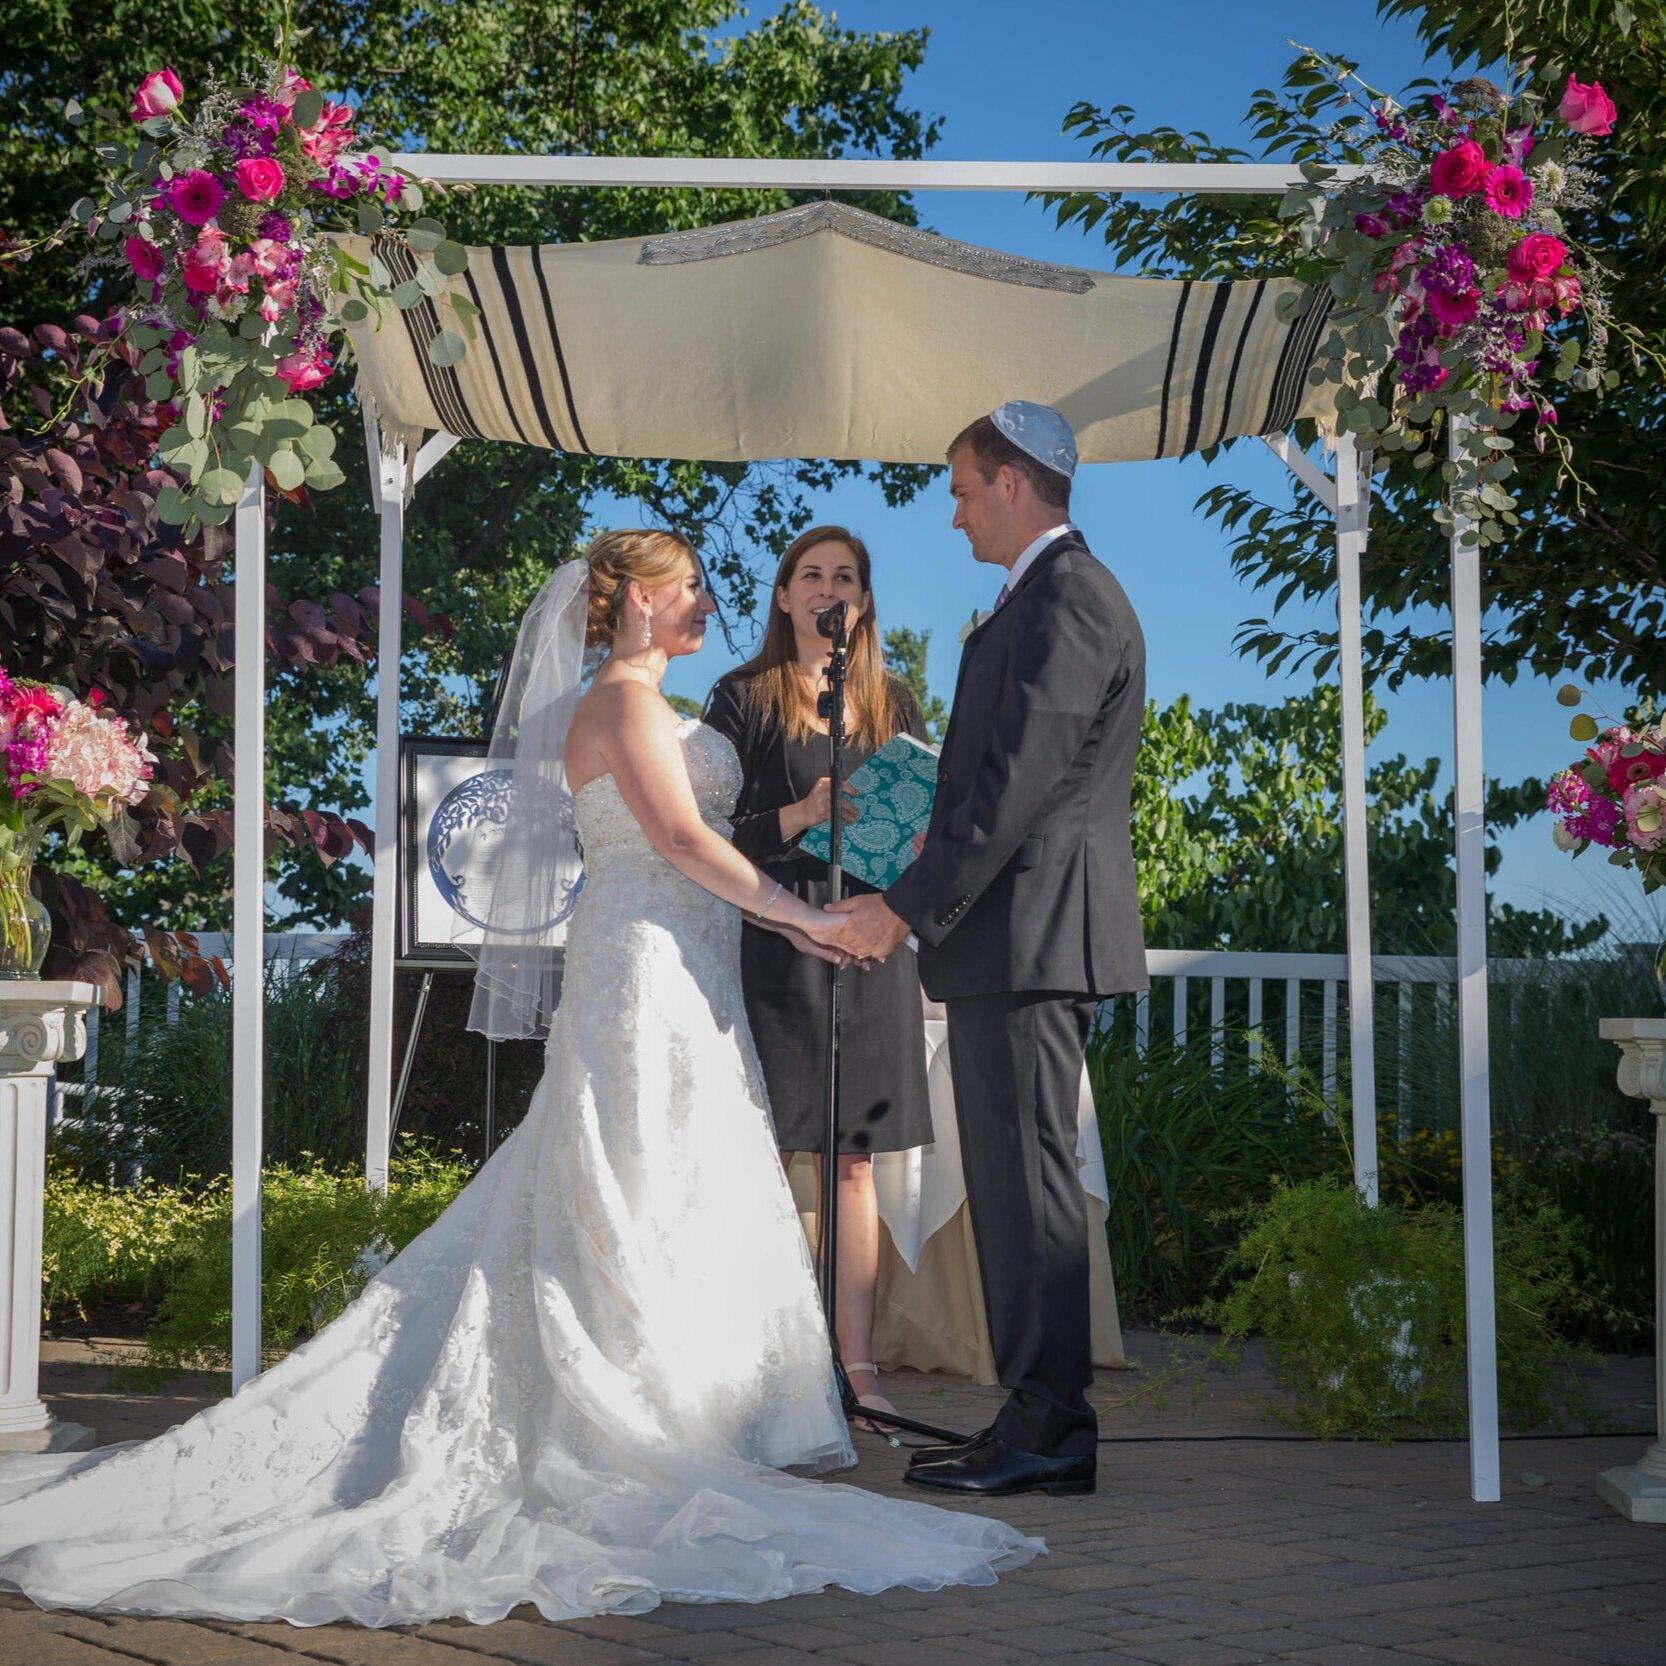 WEDDINGS BY YAEL - Yael Maxwell DeVitaNon-denominational Minister and Vow Writer(661) 644-0337weddingsbyyael@gmail.com